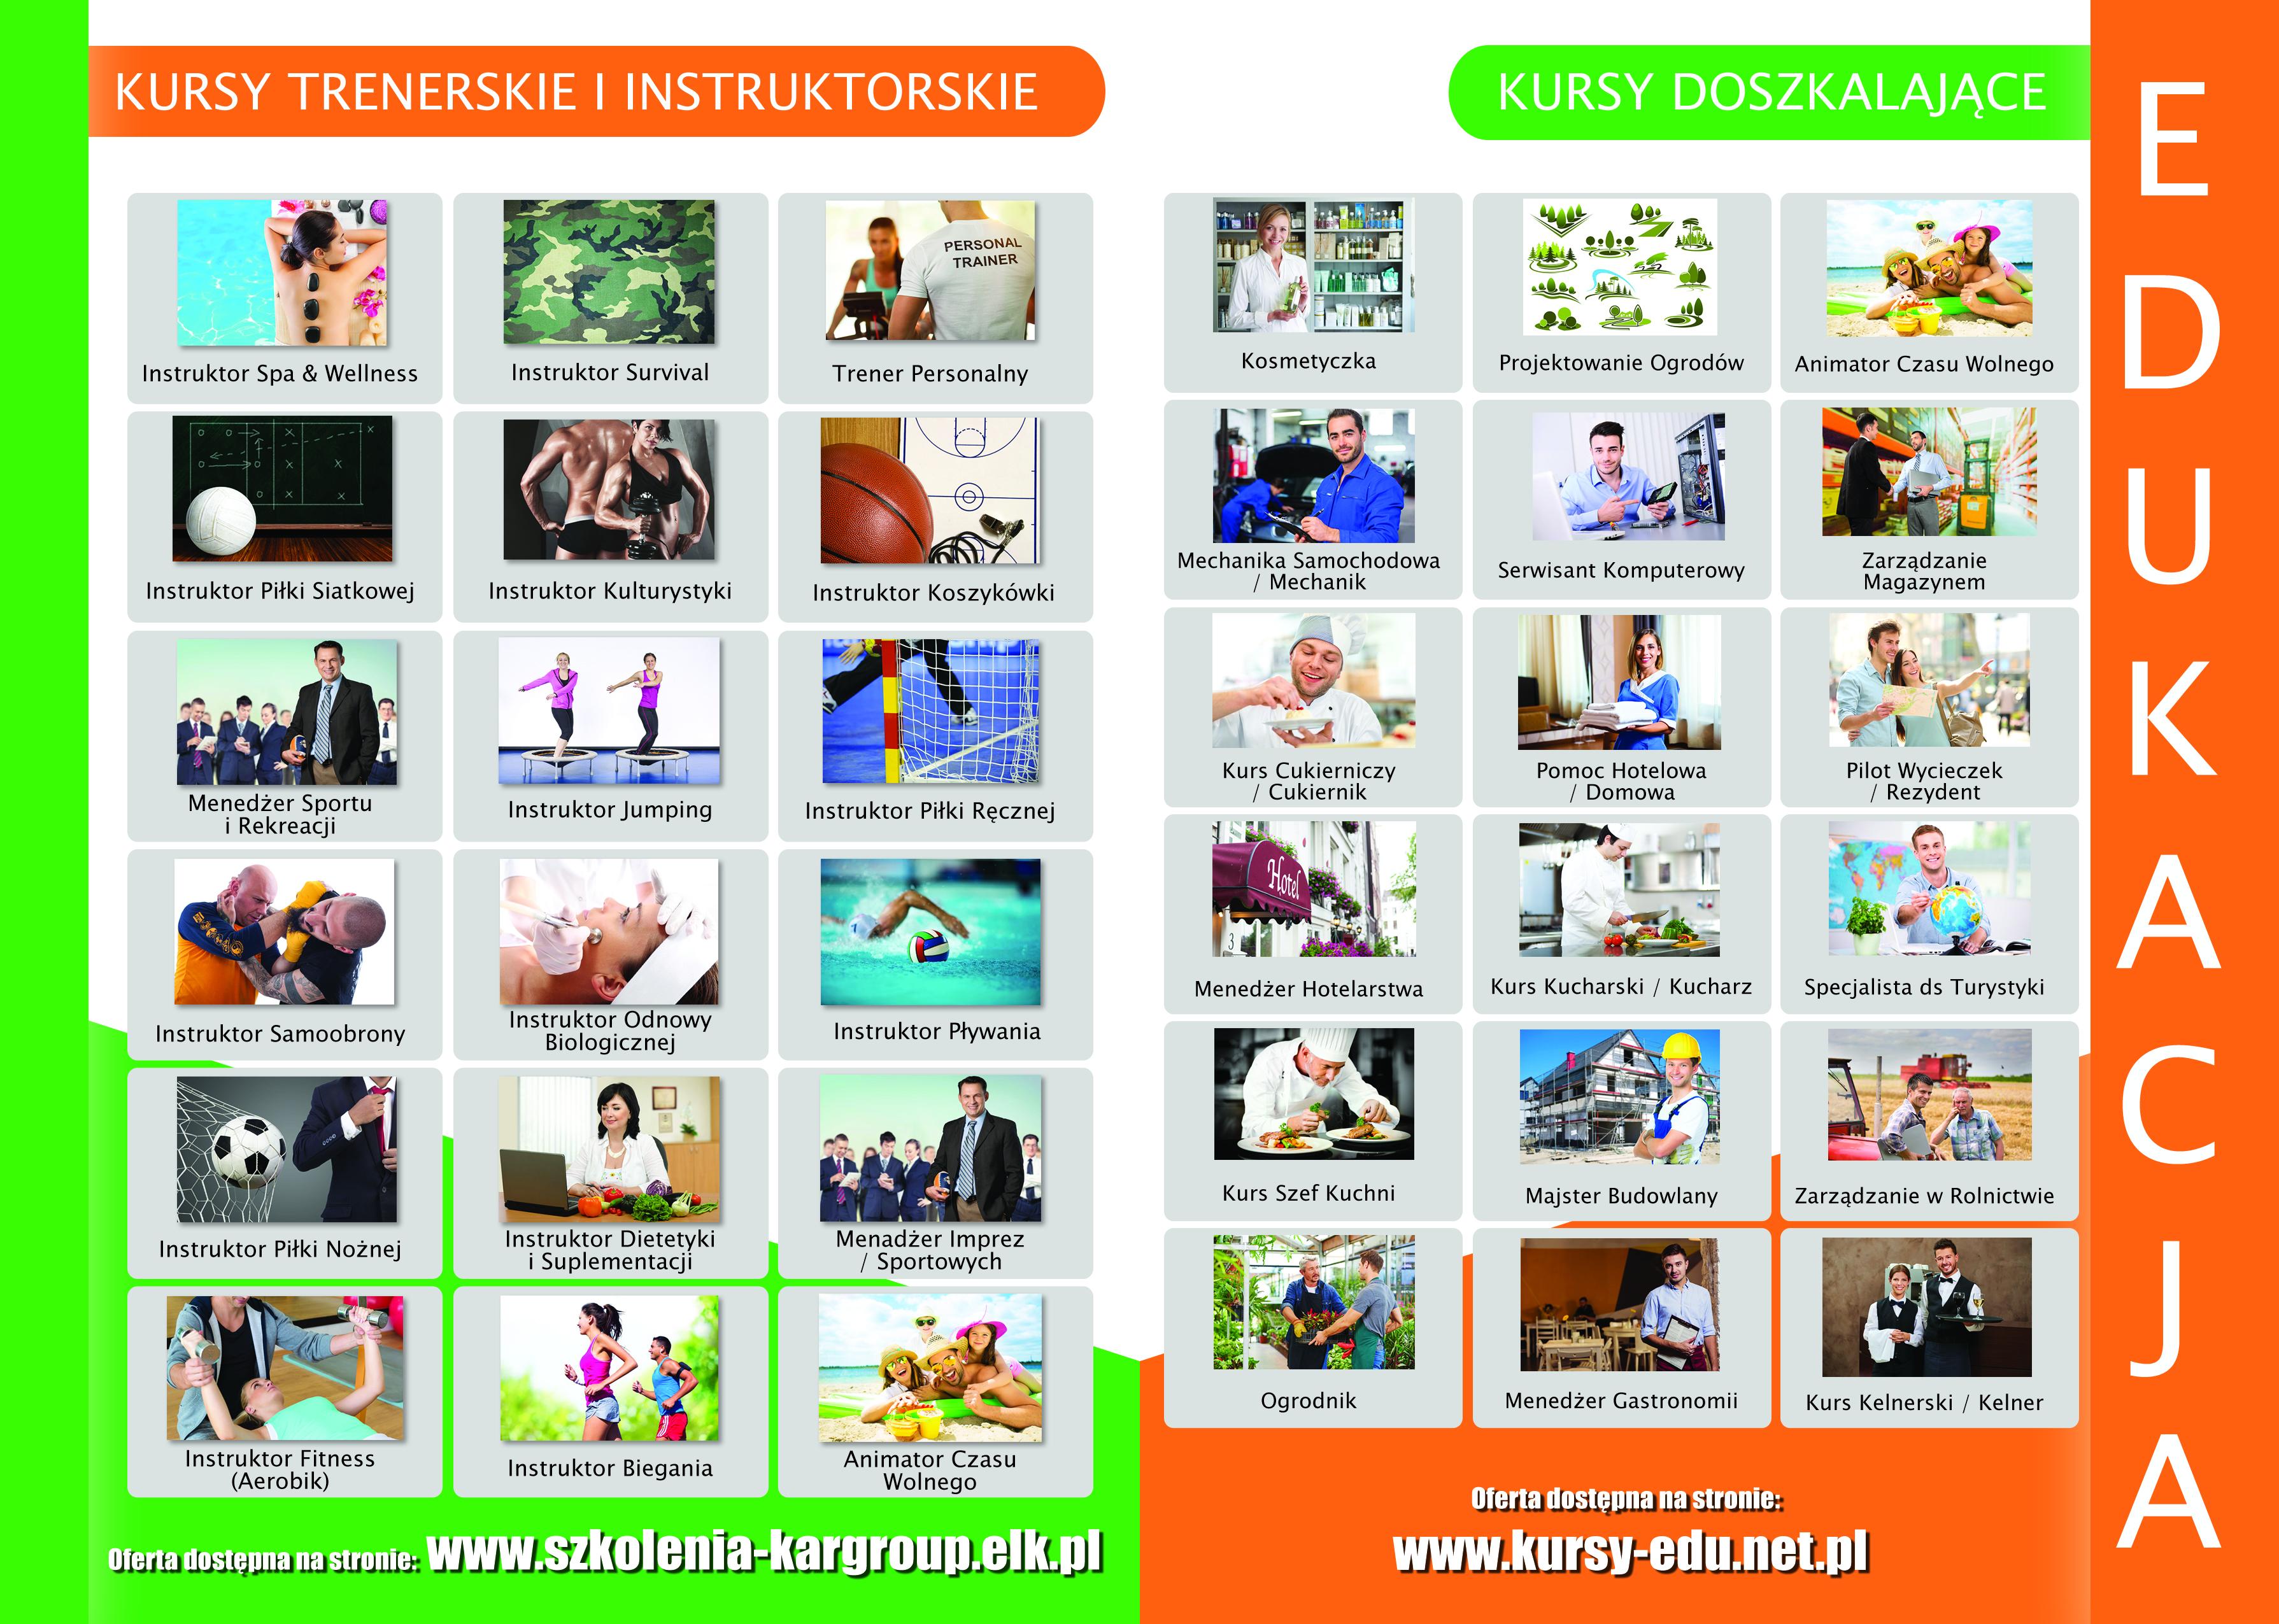 http://szkolenia-kargroup.elk.pl/wp-content/uploads/2015/07/szkolenia-online1.jpg